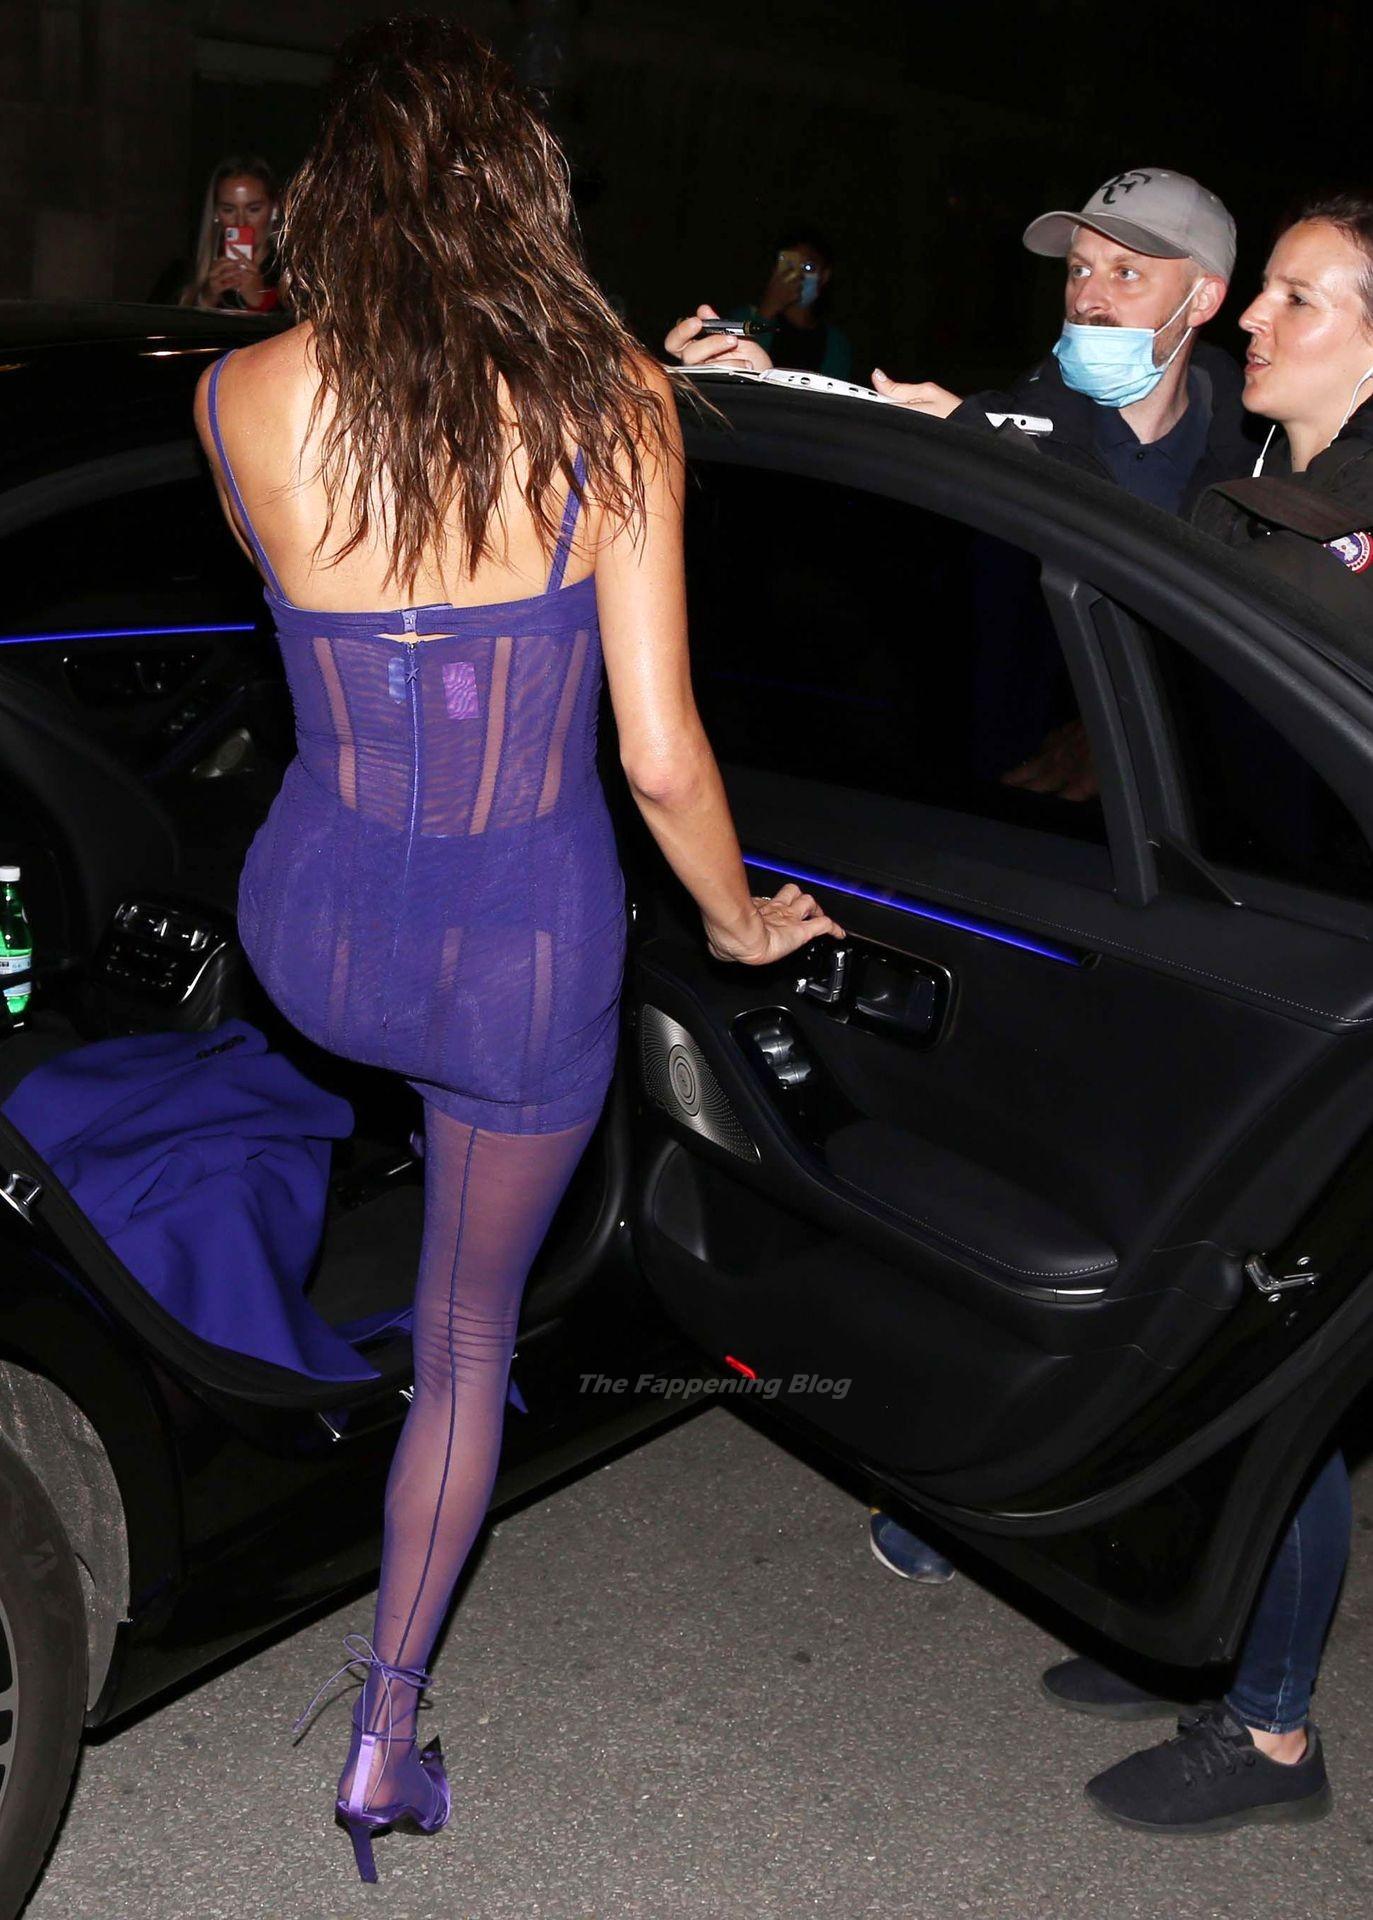 Alessandra-Ambrosio-Sexy-The-Fappening-Blog-99-1.jpg